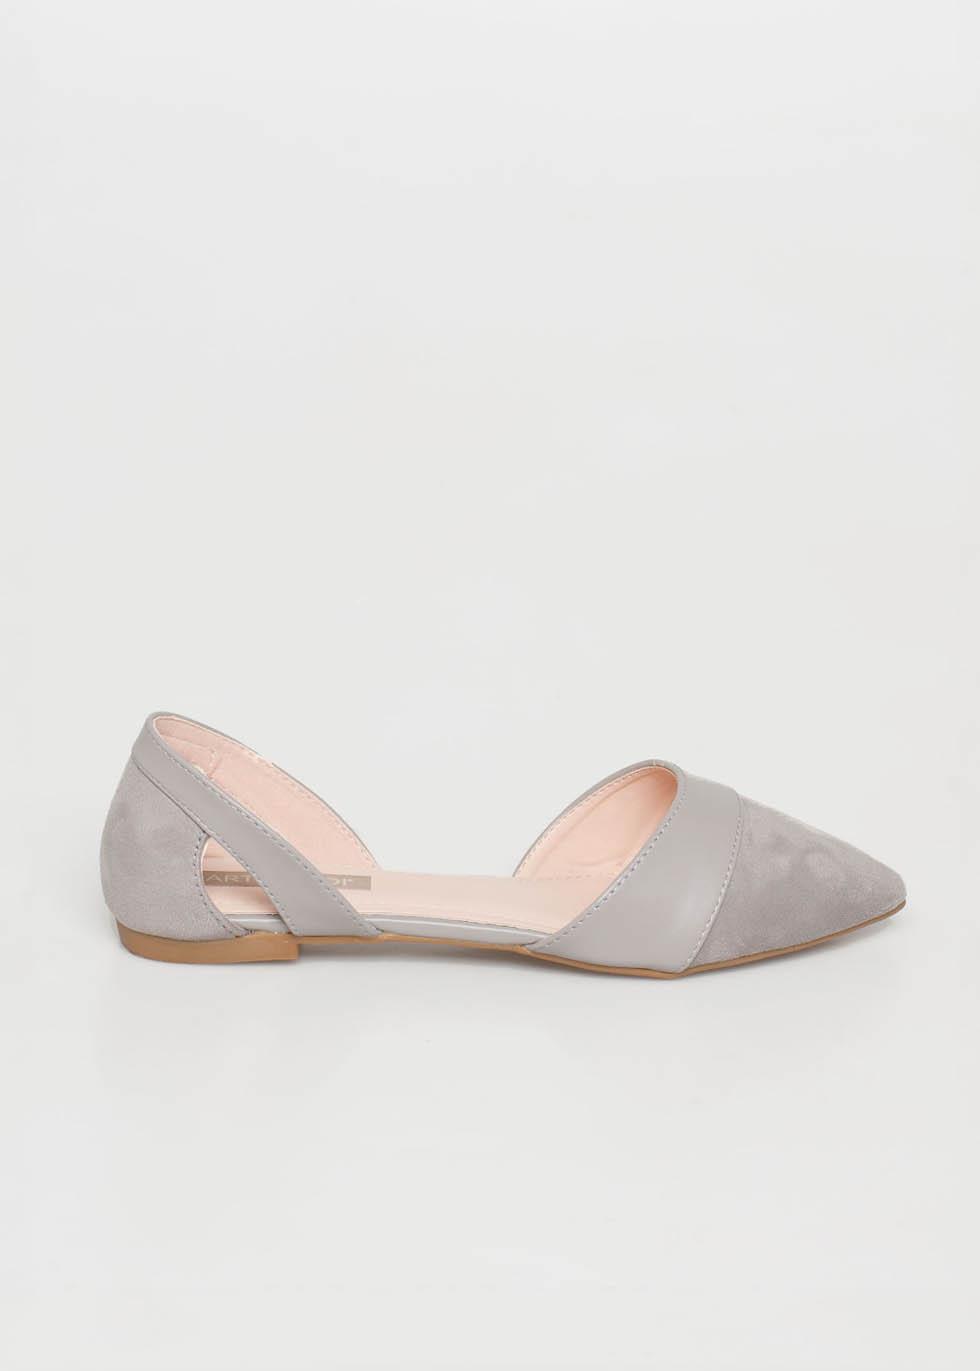 Alice pointed flat shoe, γκρι γόβες